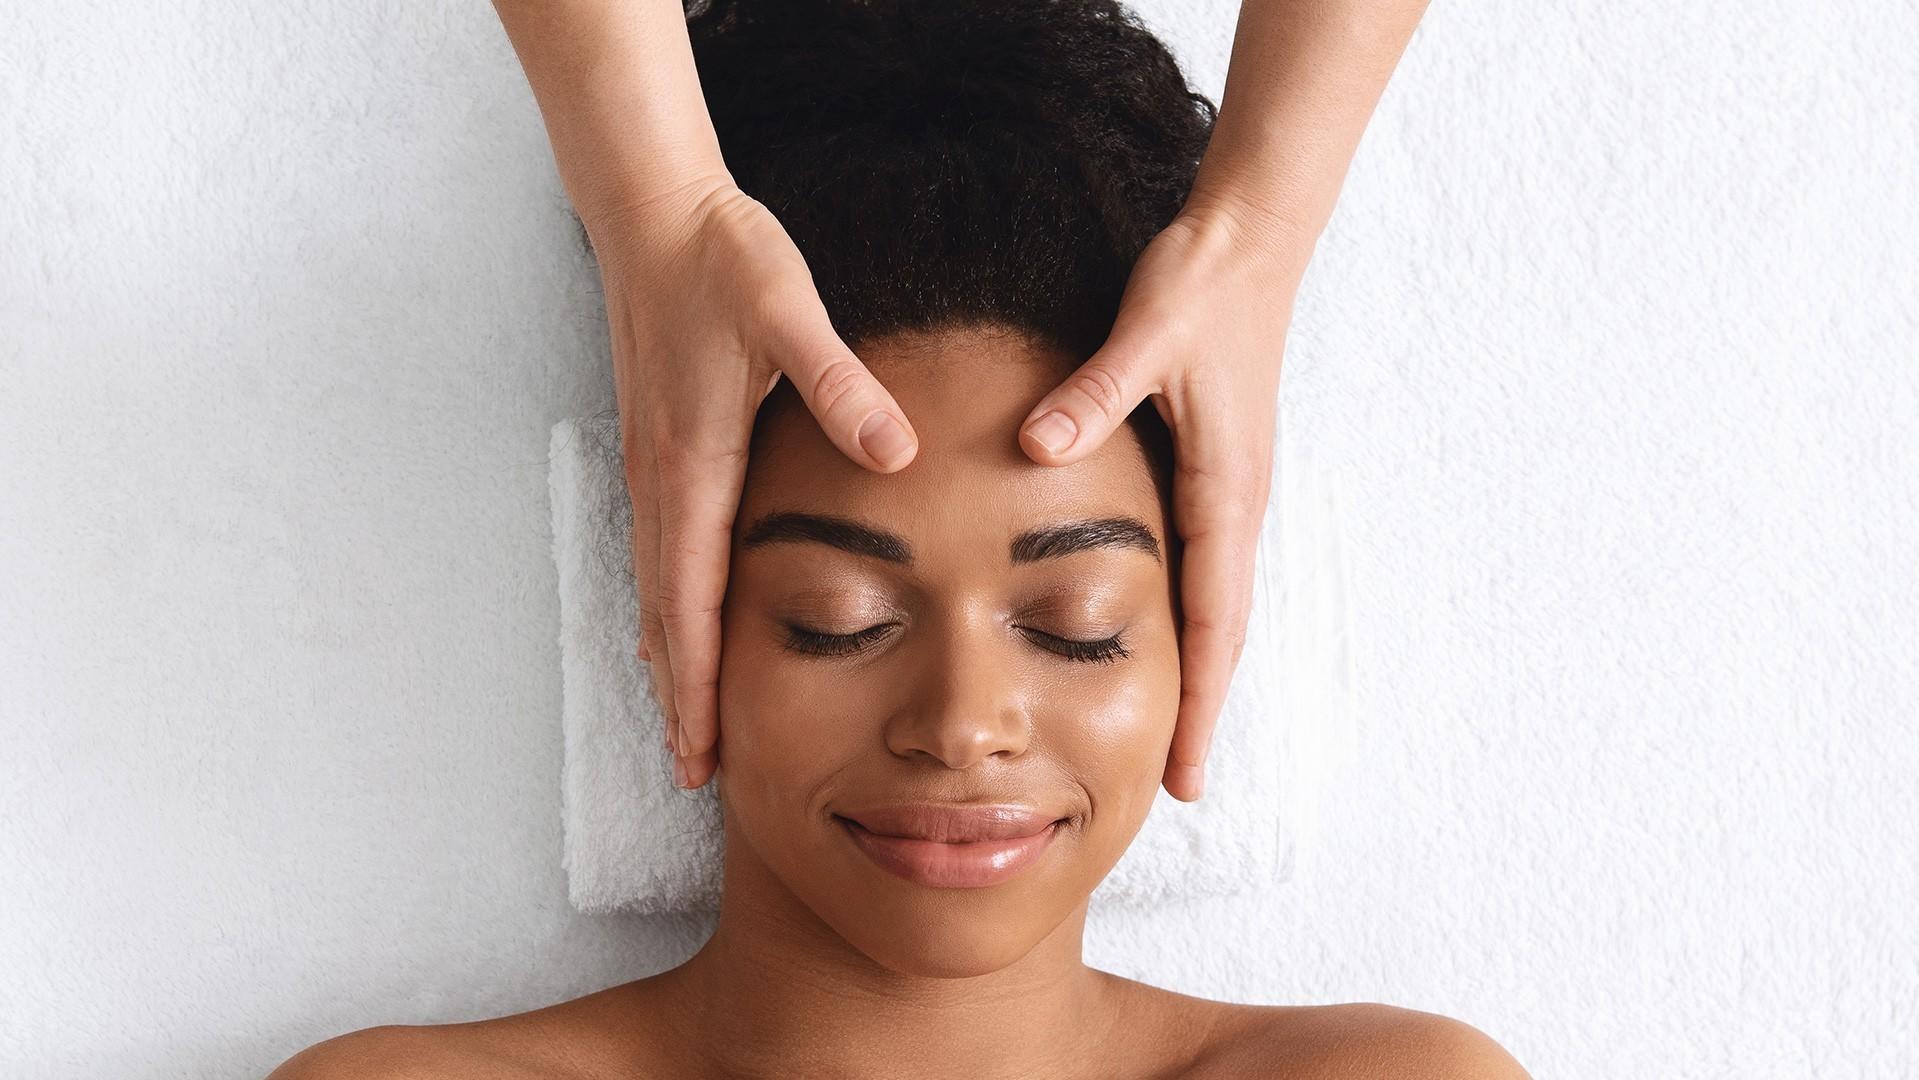 african american woman getting a head massage - Indian Head Massage offered at pureBalance Wellness